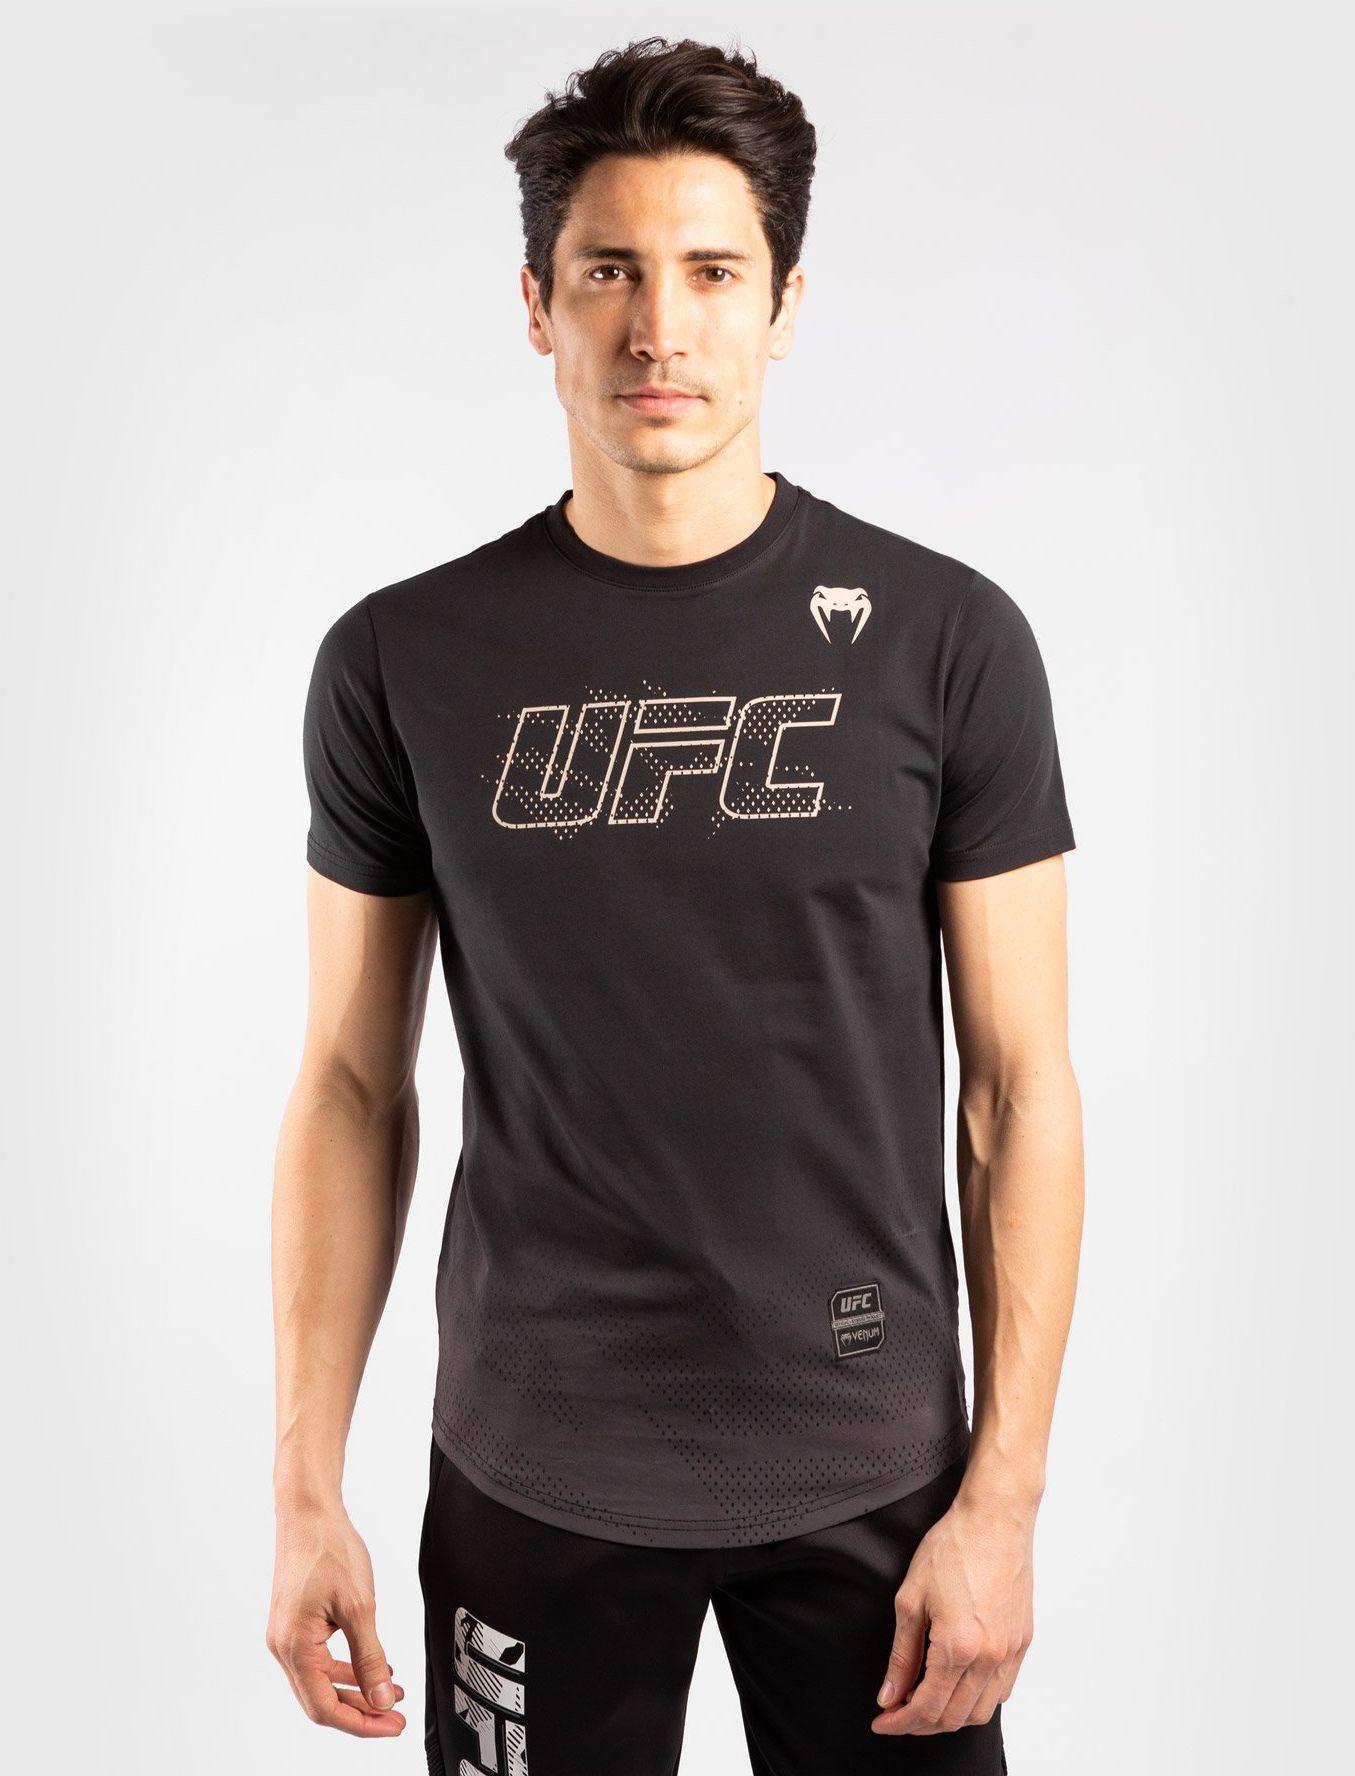 T-SHIRT KOSZULKA VENUM UFC AUTHENTIC FIGHT WEEK 2 BLACK